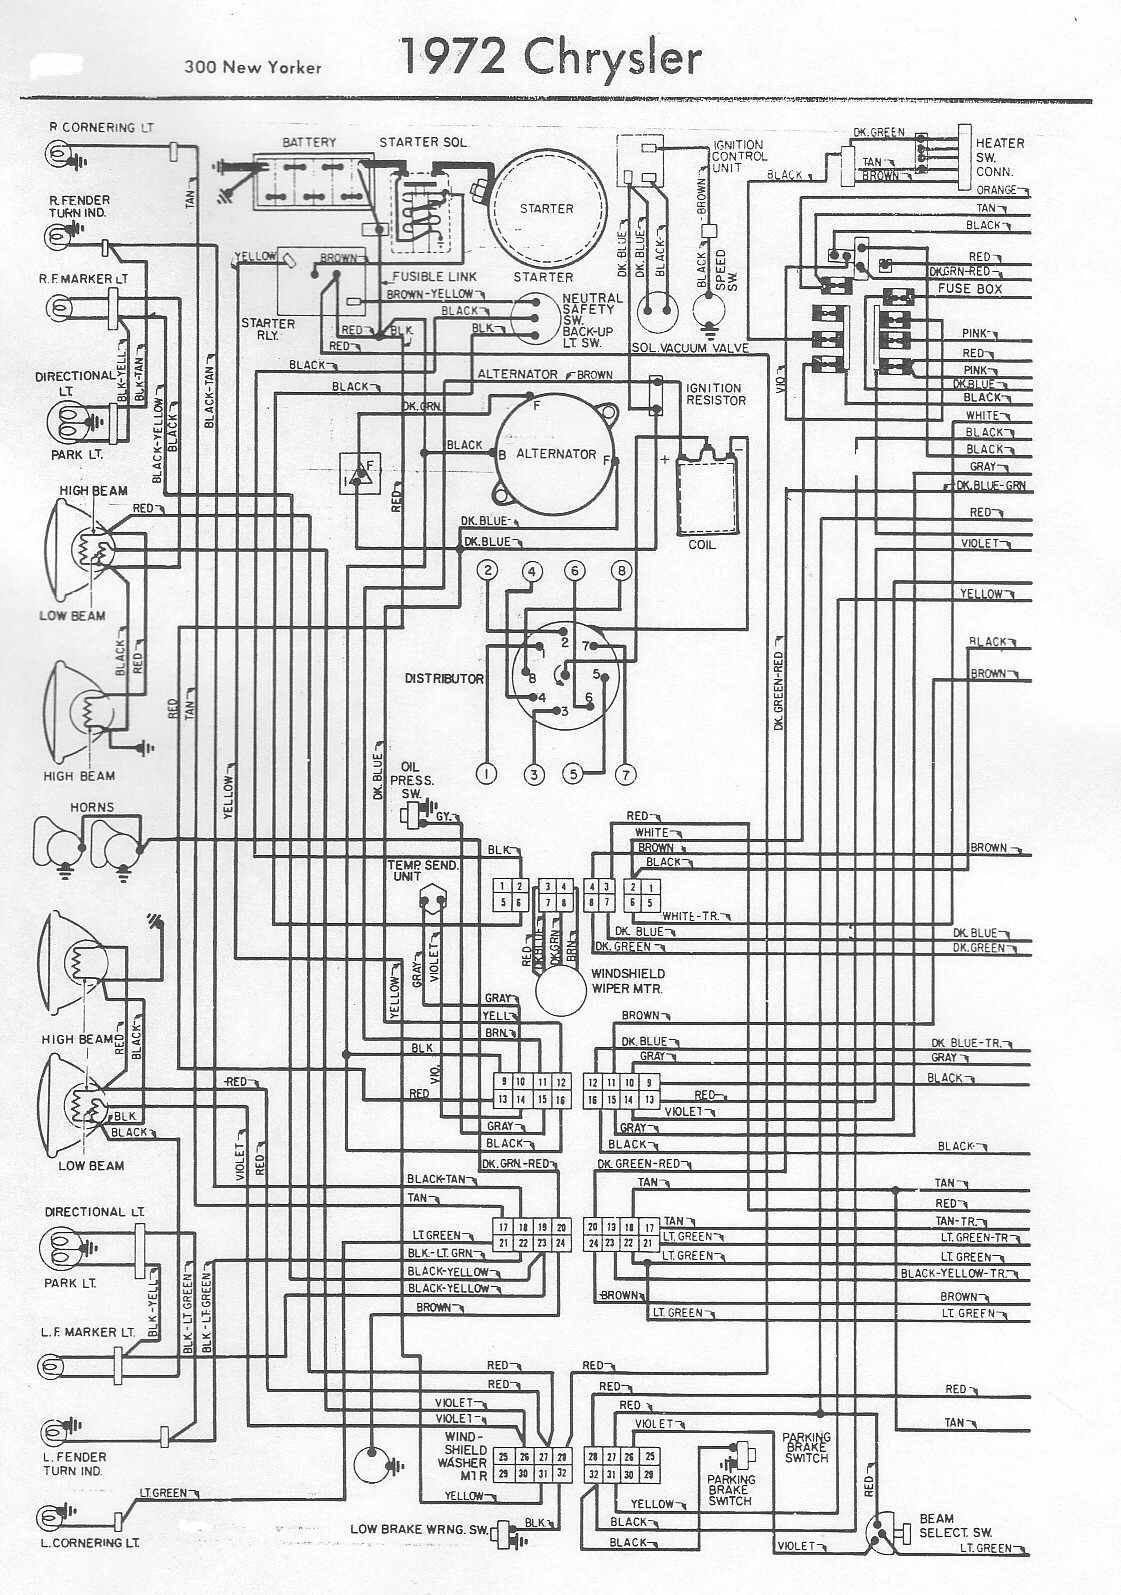 chrysler car manuals wiring diagrams pdf fault codes. Black Bedroom Furniture Sets. Home Design Ideas